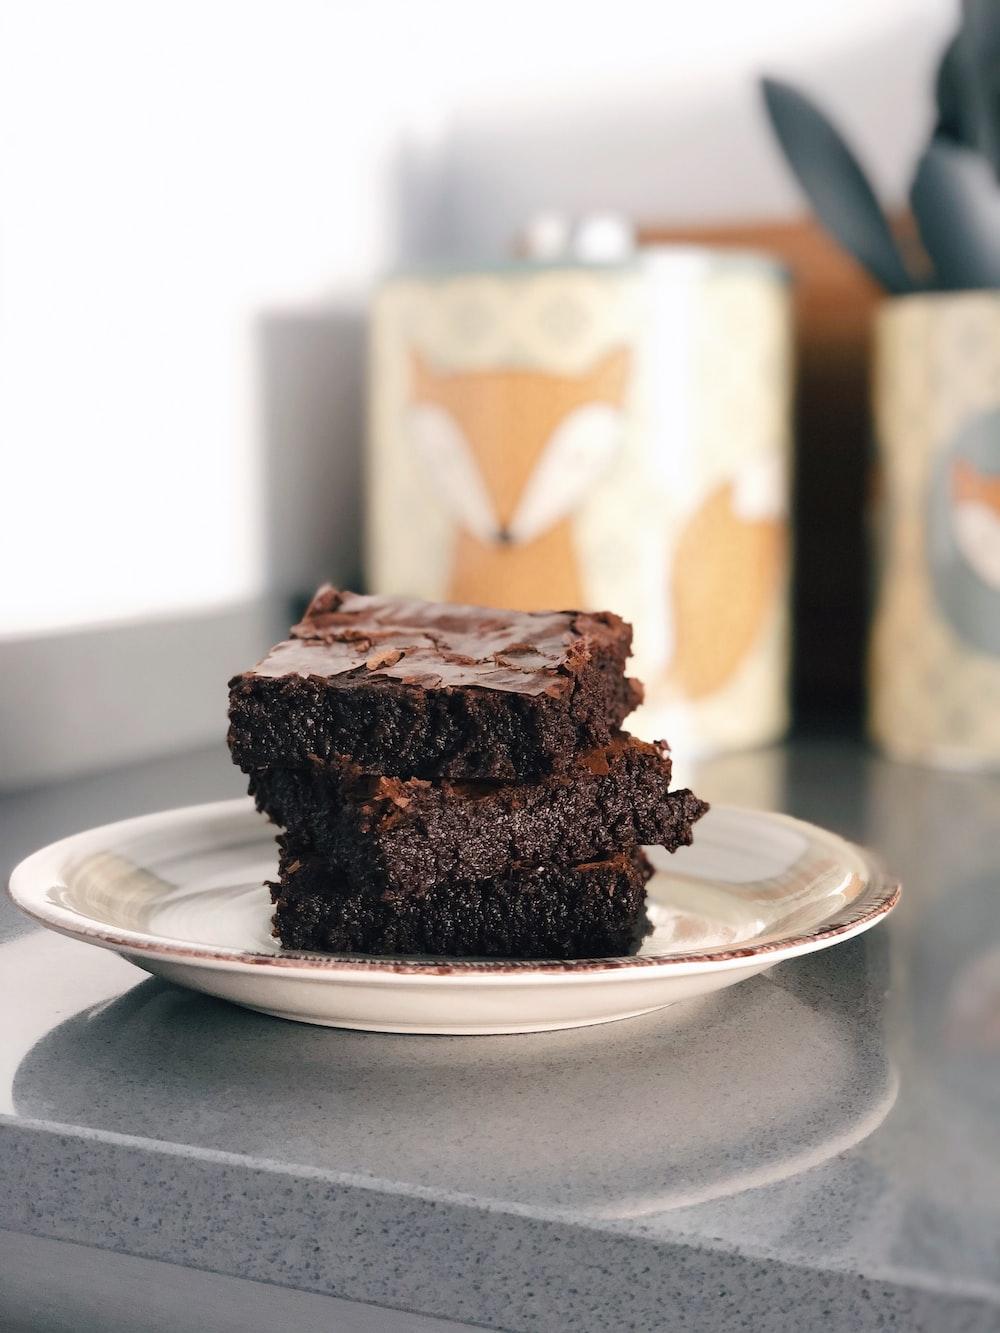 chocolate cake on white ceramic plate